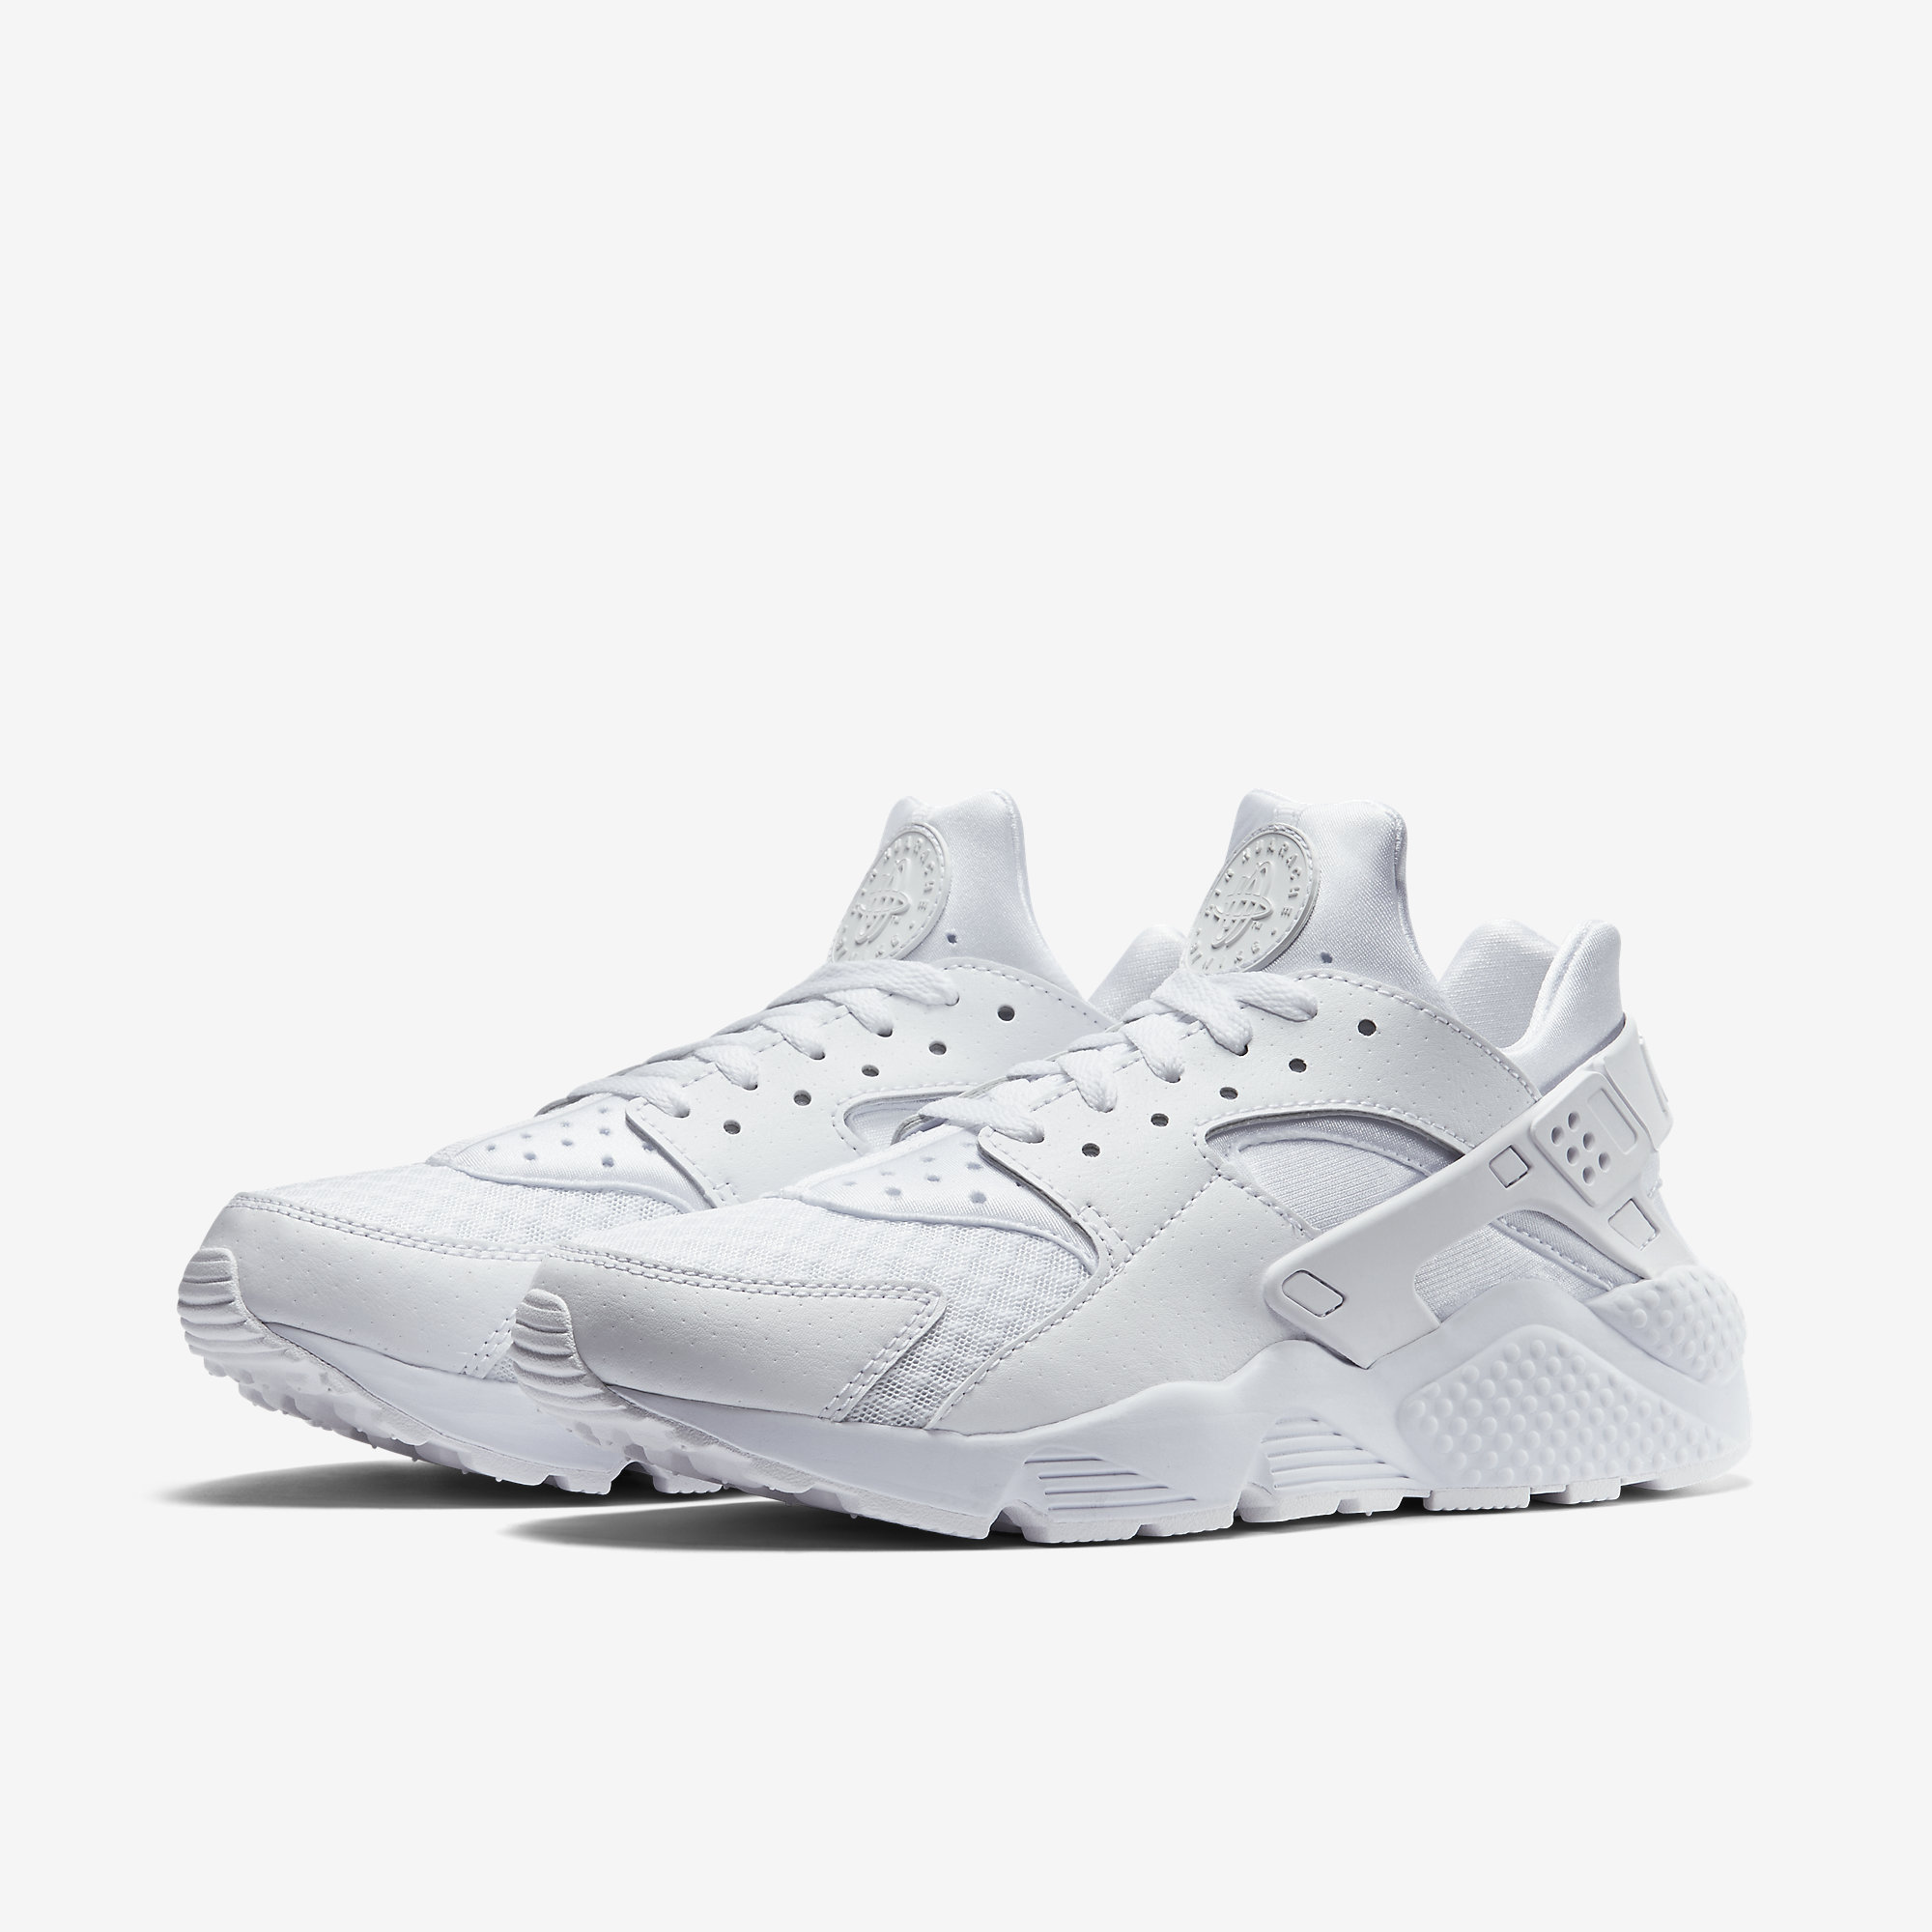 NIKE AIR HUARACHE Mens sneakers 318429-111 by Nike